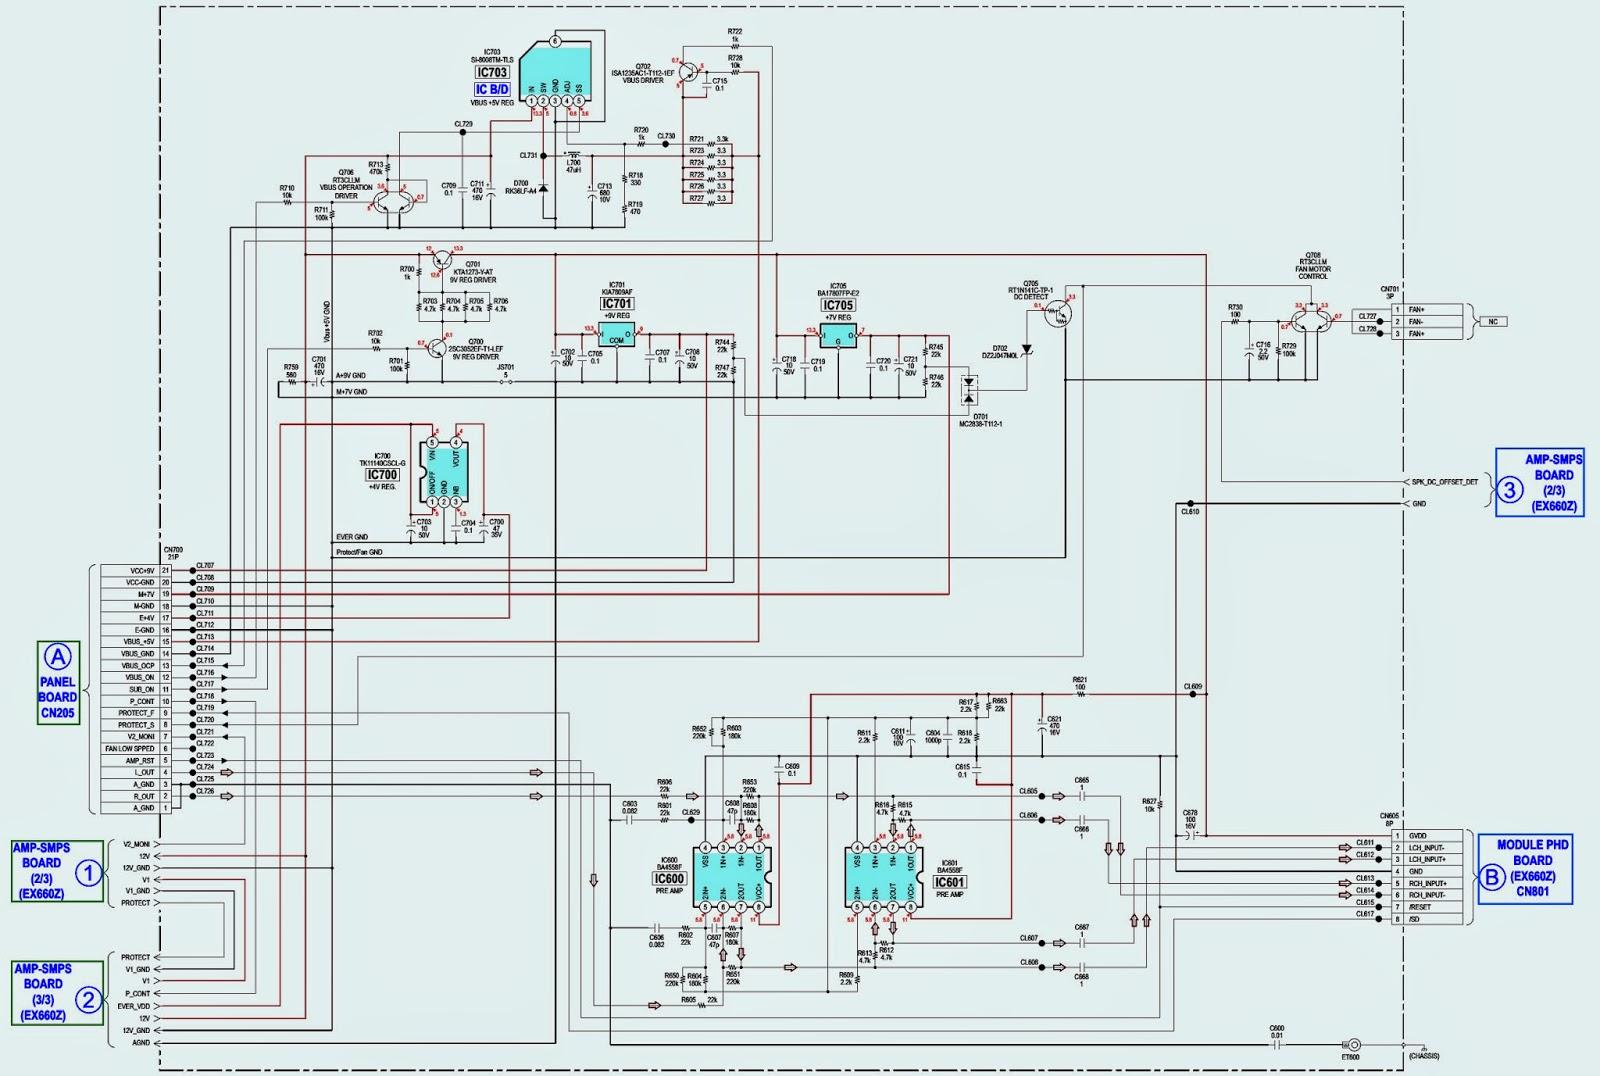 2016 f150 sony wiring diagram e39 engine taskmaster 5100 heater library